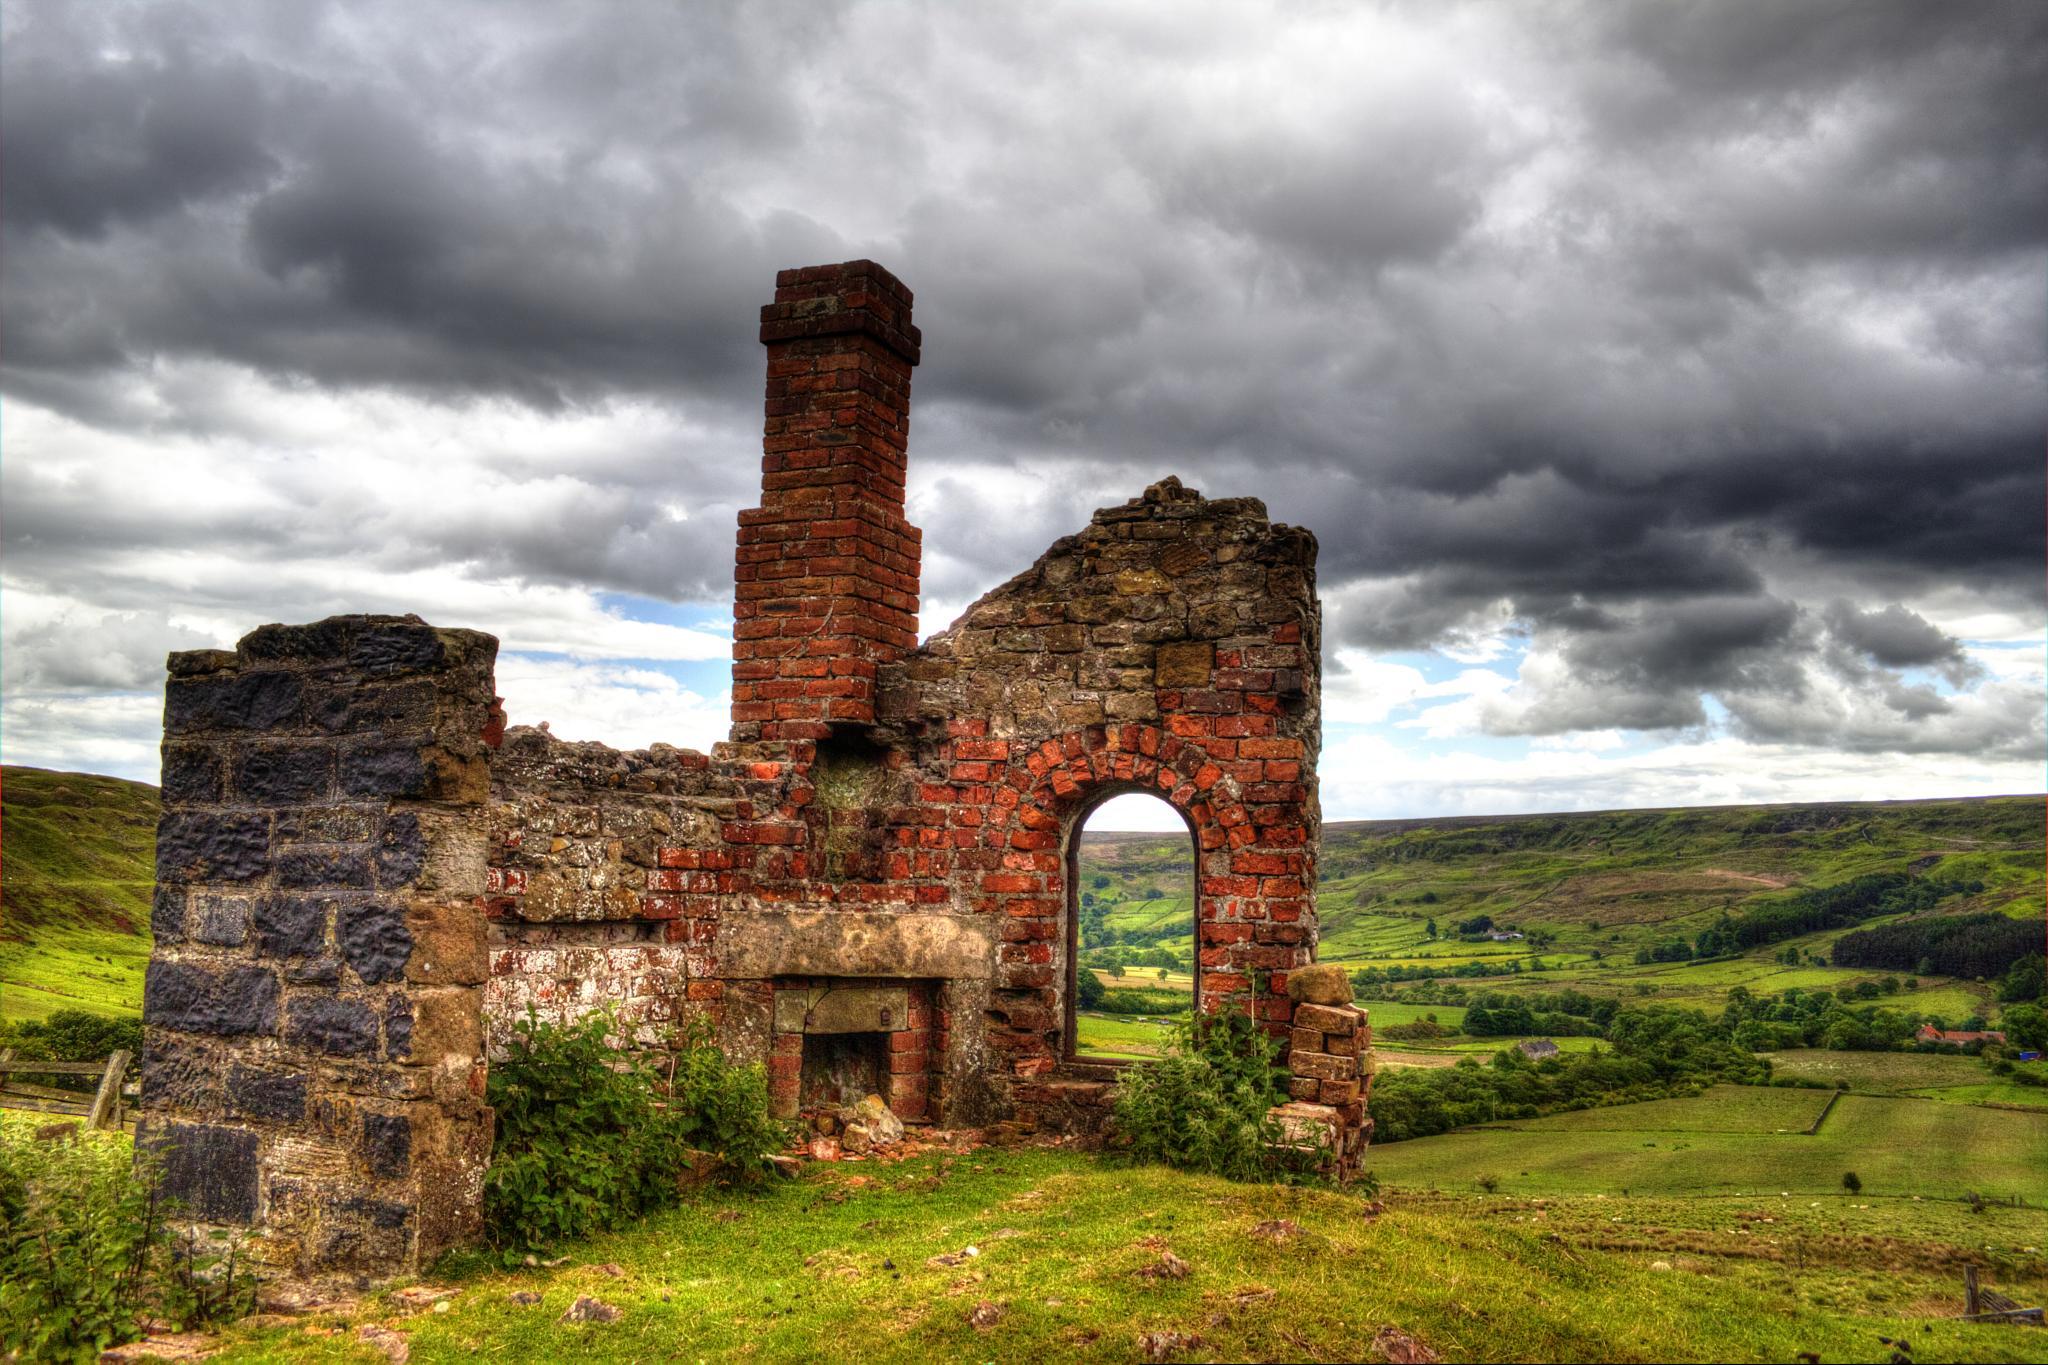 Engine House ruin, Rosedale East by john jenkinson